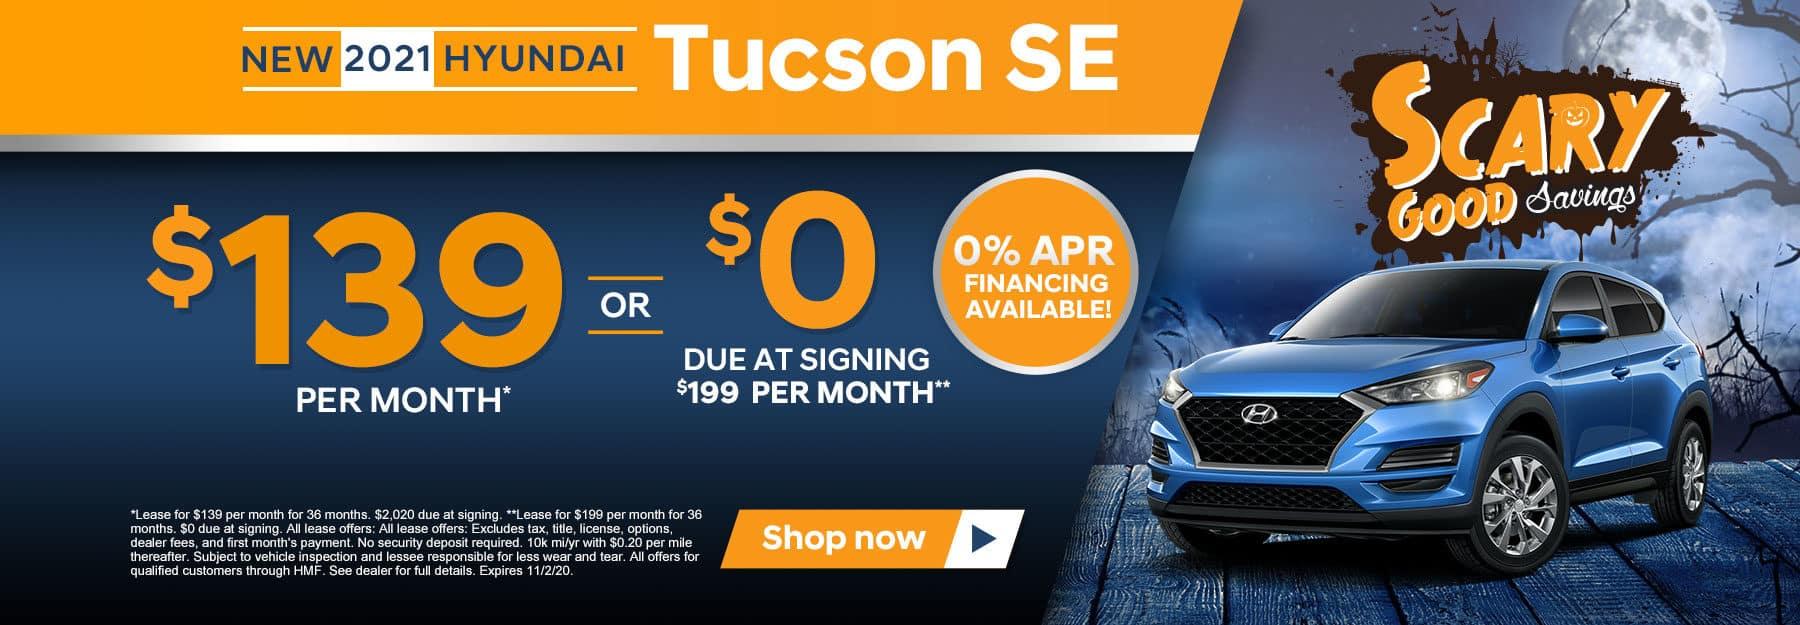 DennisHyundai_Slide_1800x625_10-20_Tucson (1)5